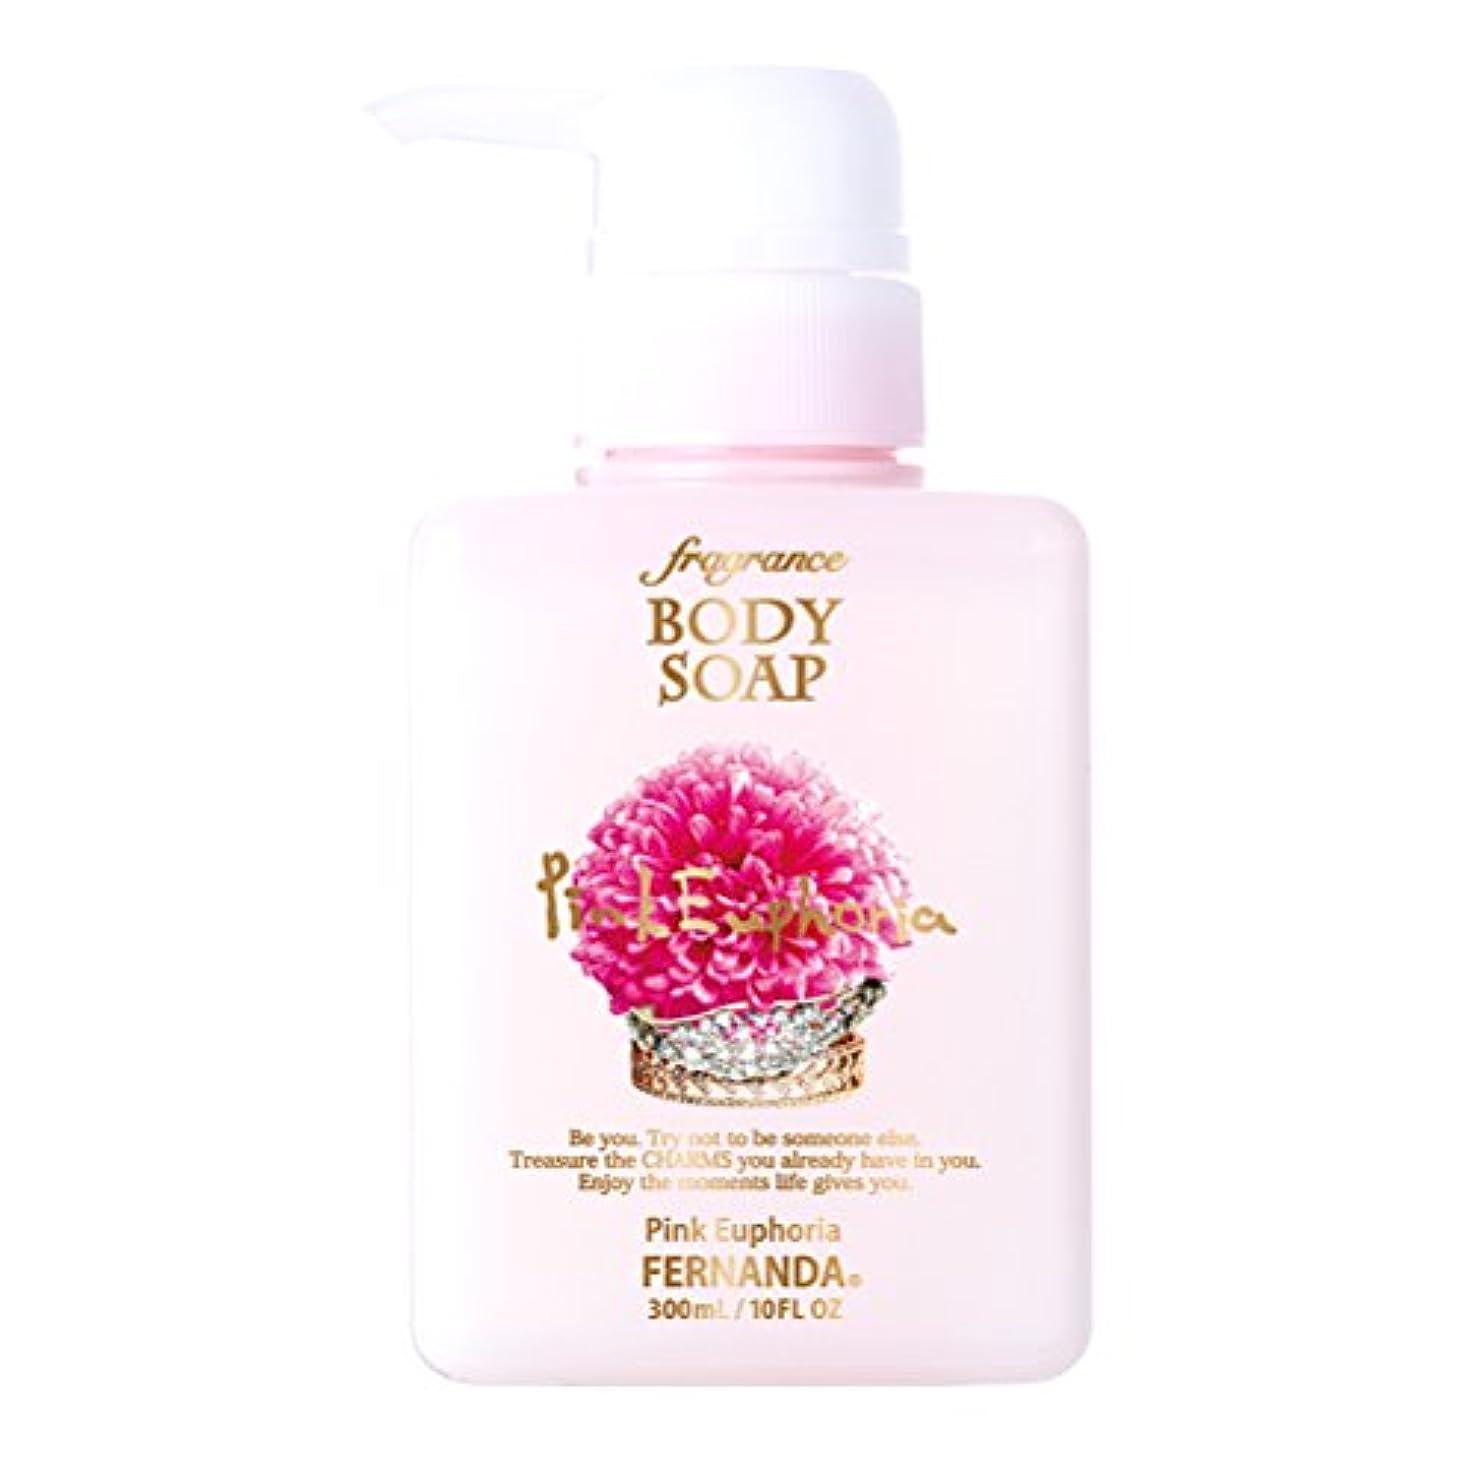 FERNANDA(フェルナンダ) Fragrance Body Soap Pink Euphoria (ボディソープ ピンクエウフォリア)